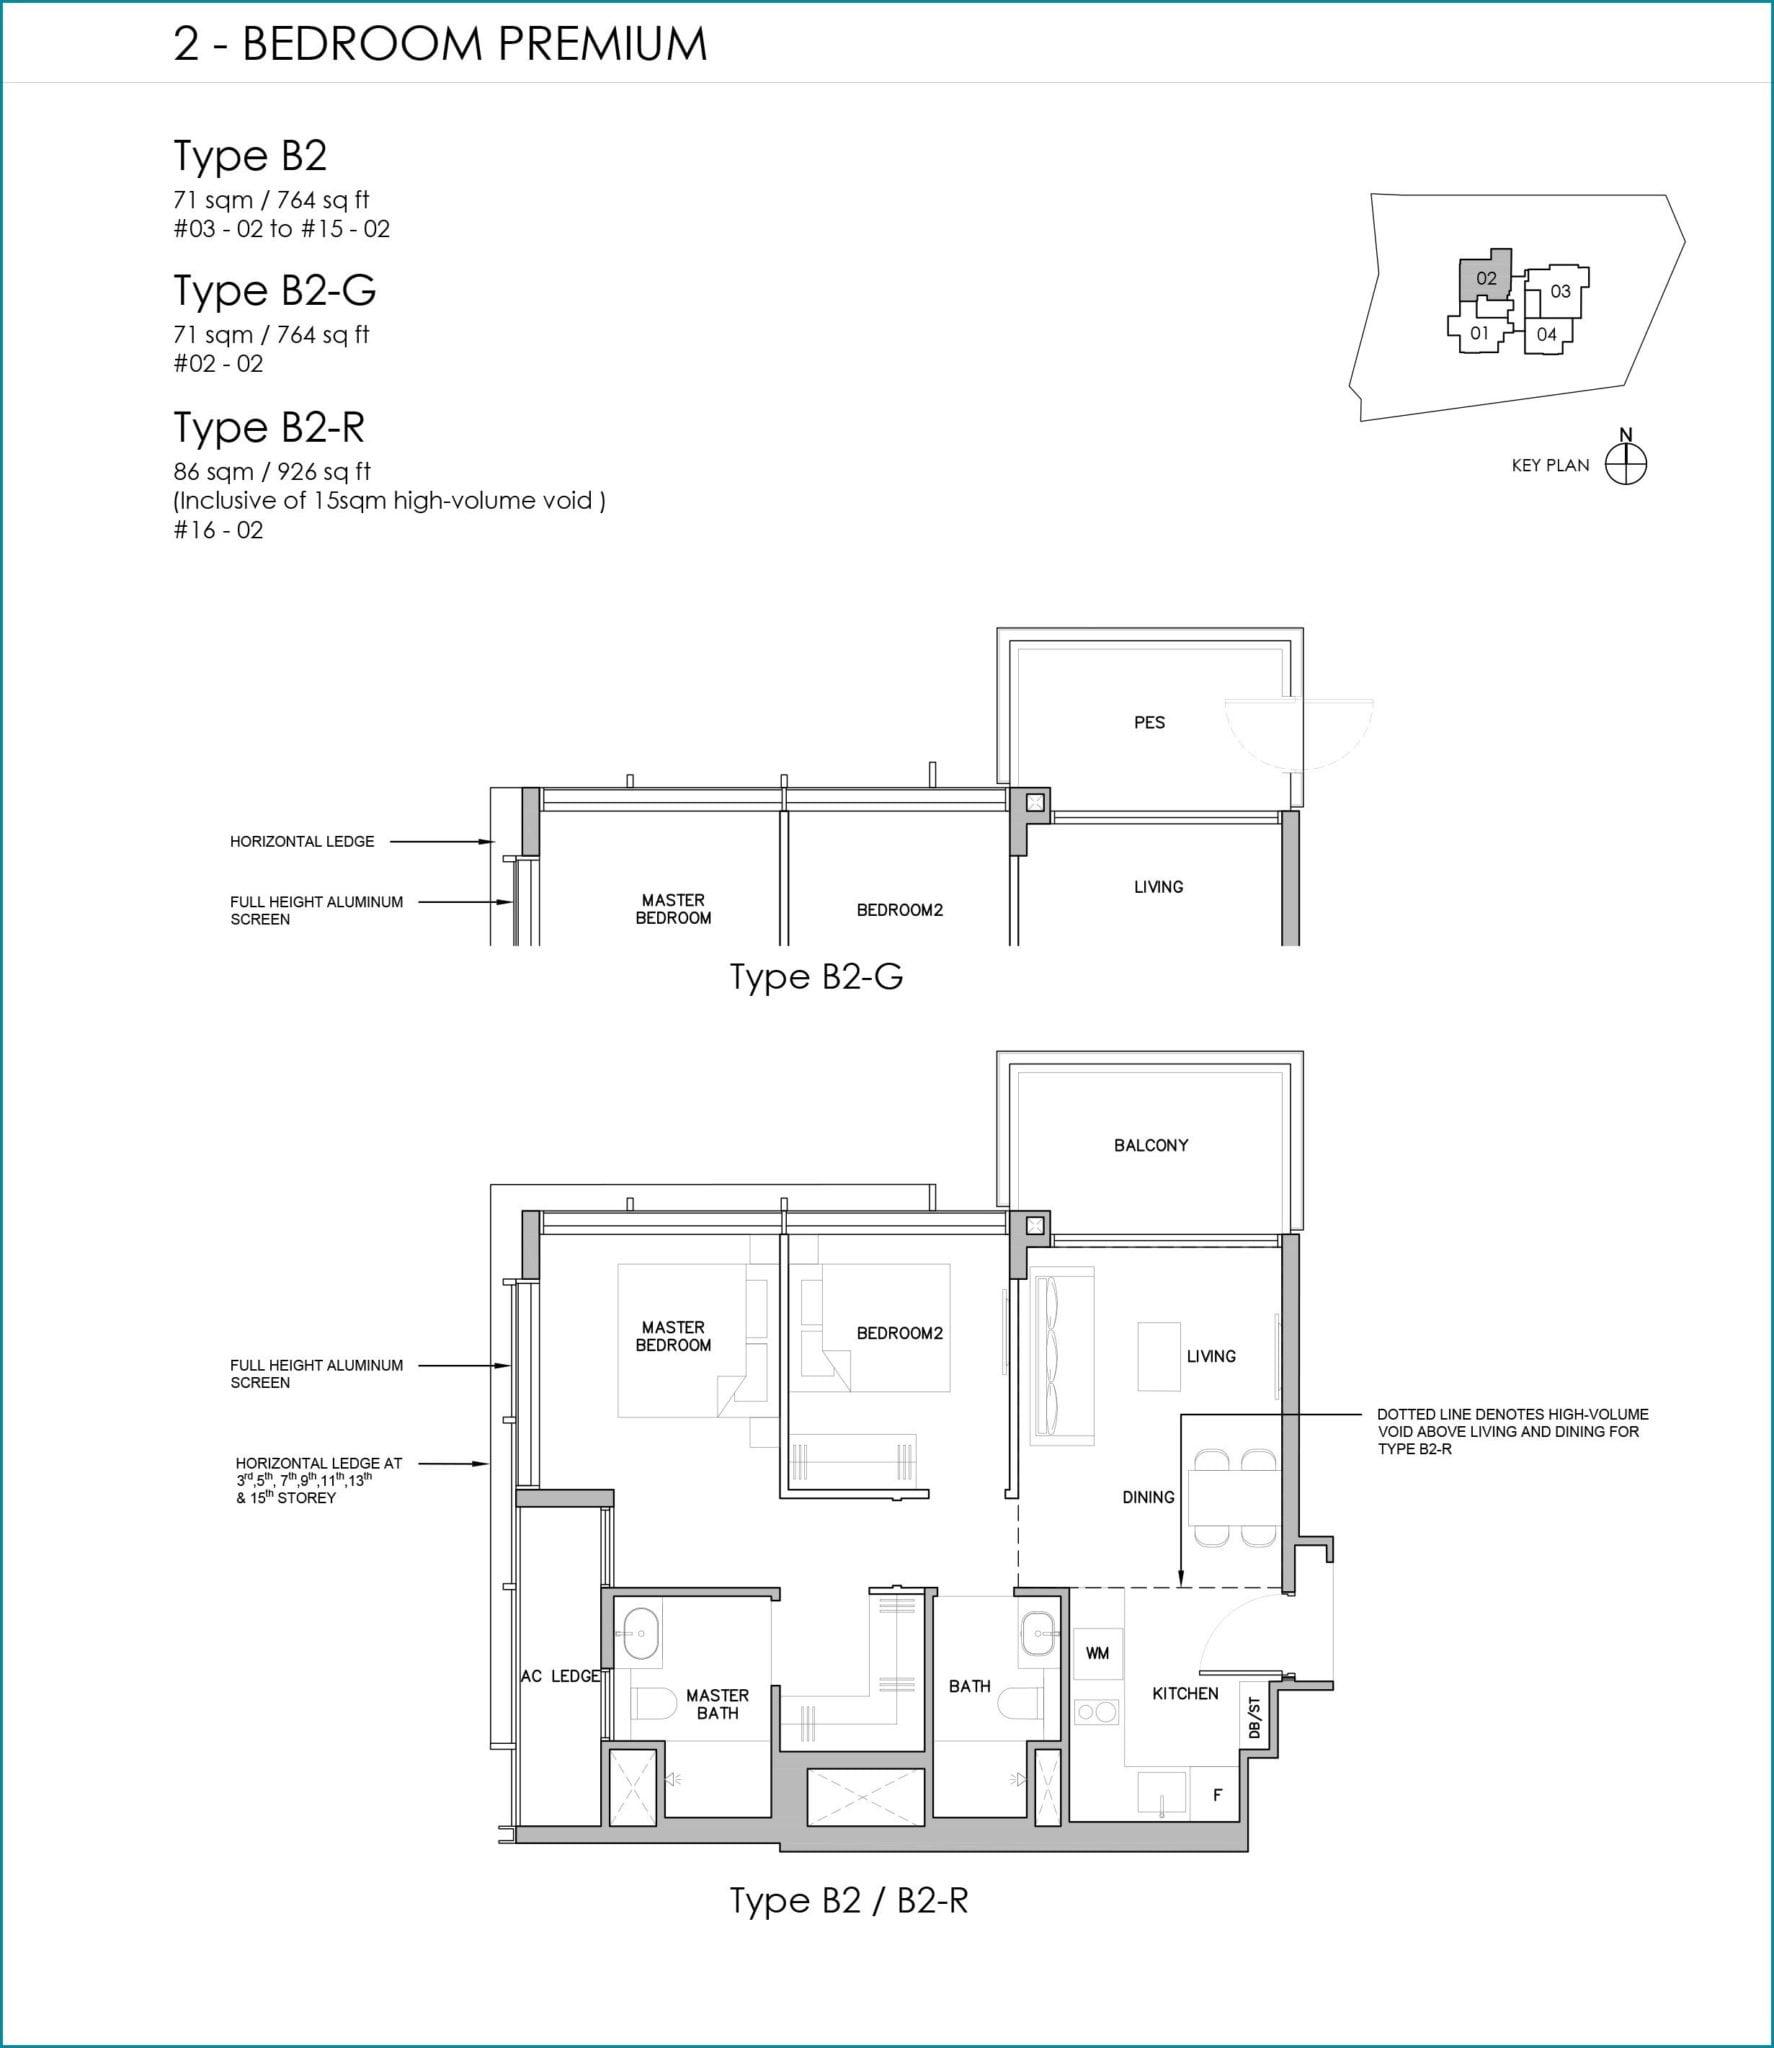 grange-1866-Floor Plan 2BR Premium B2